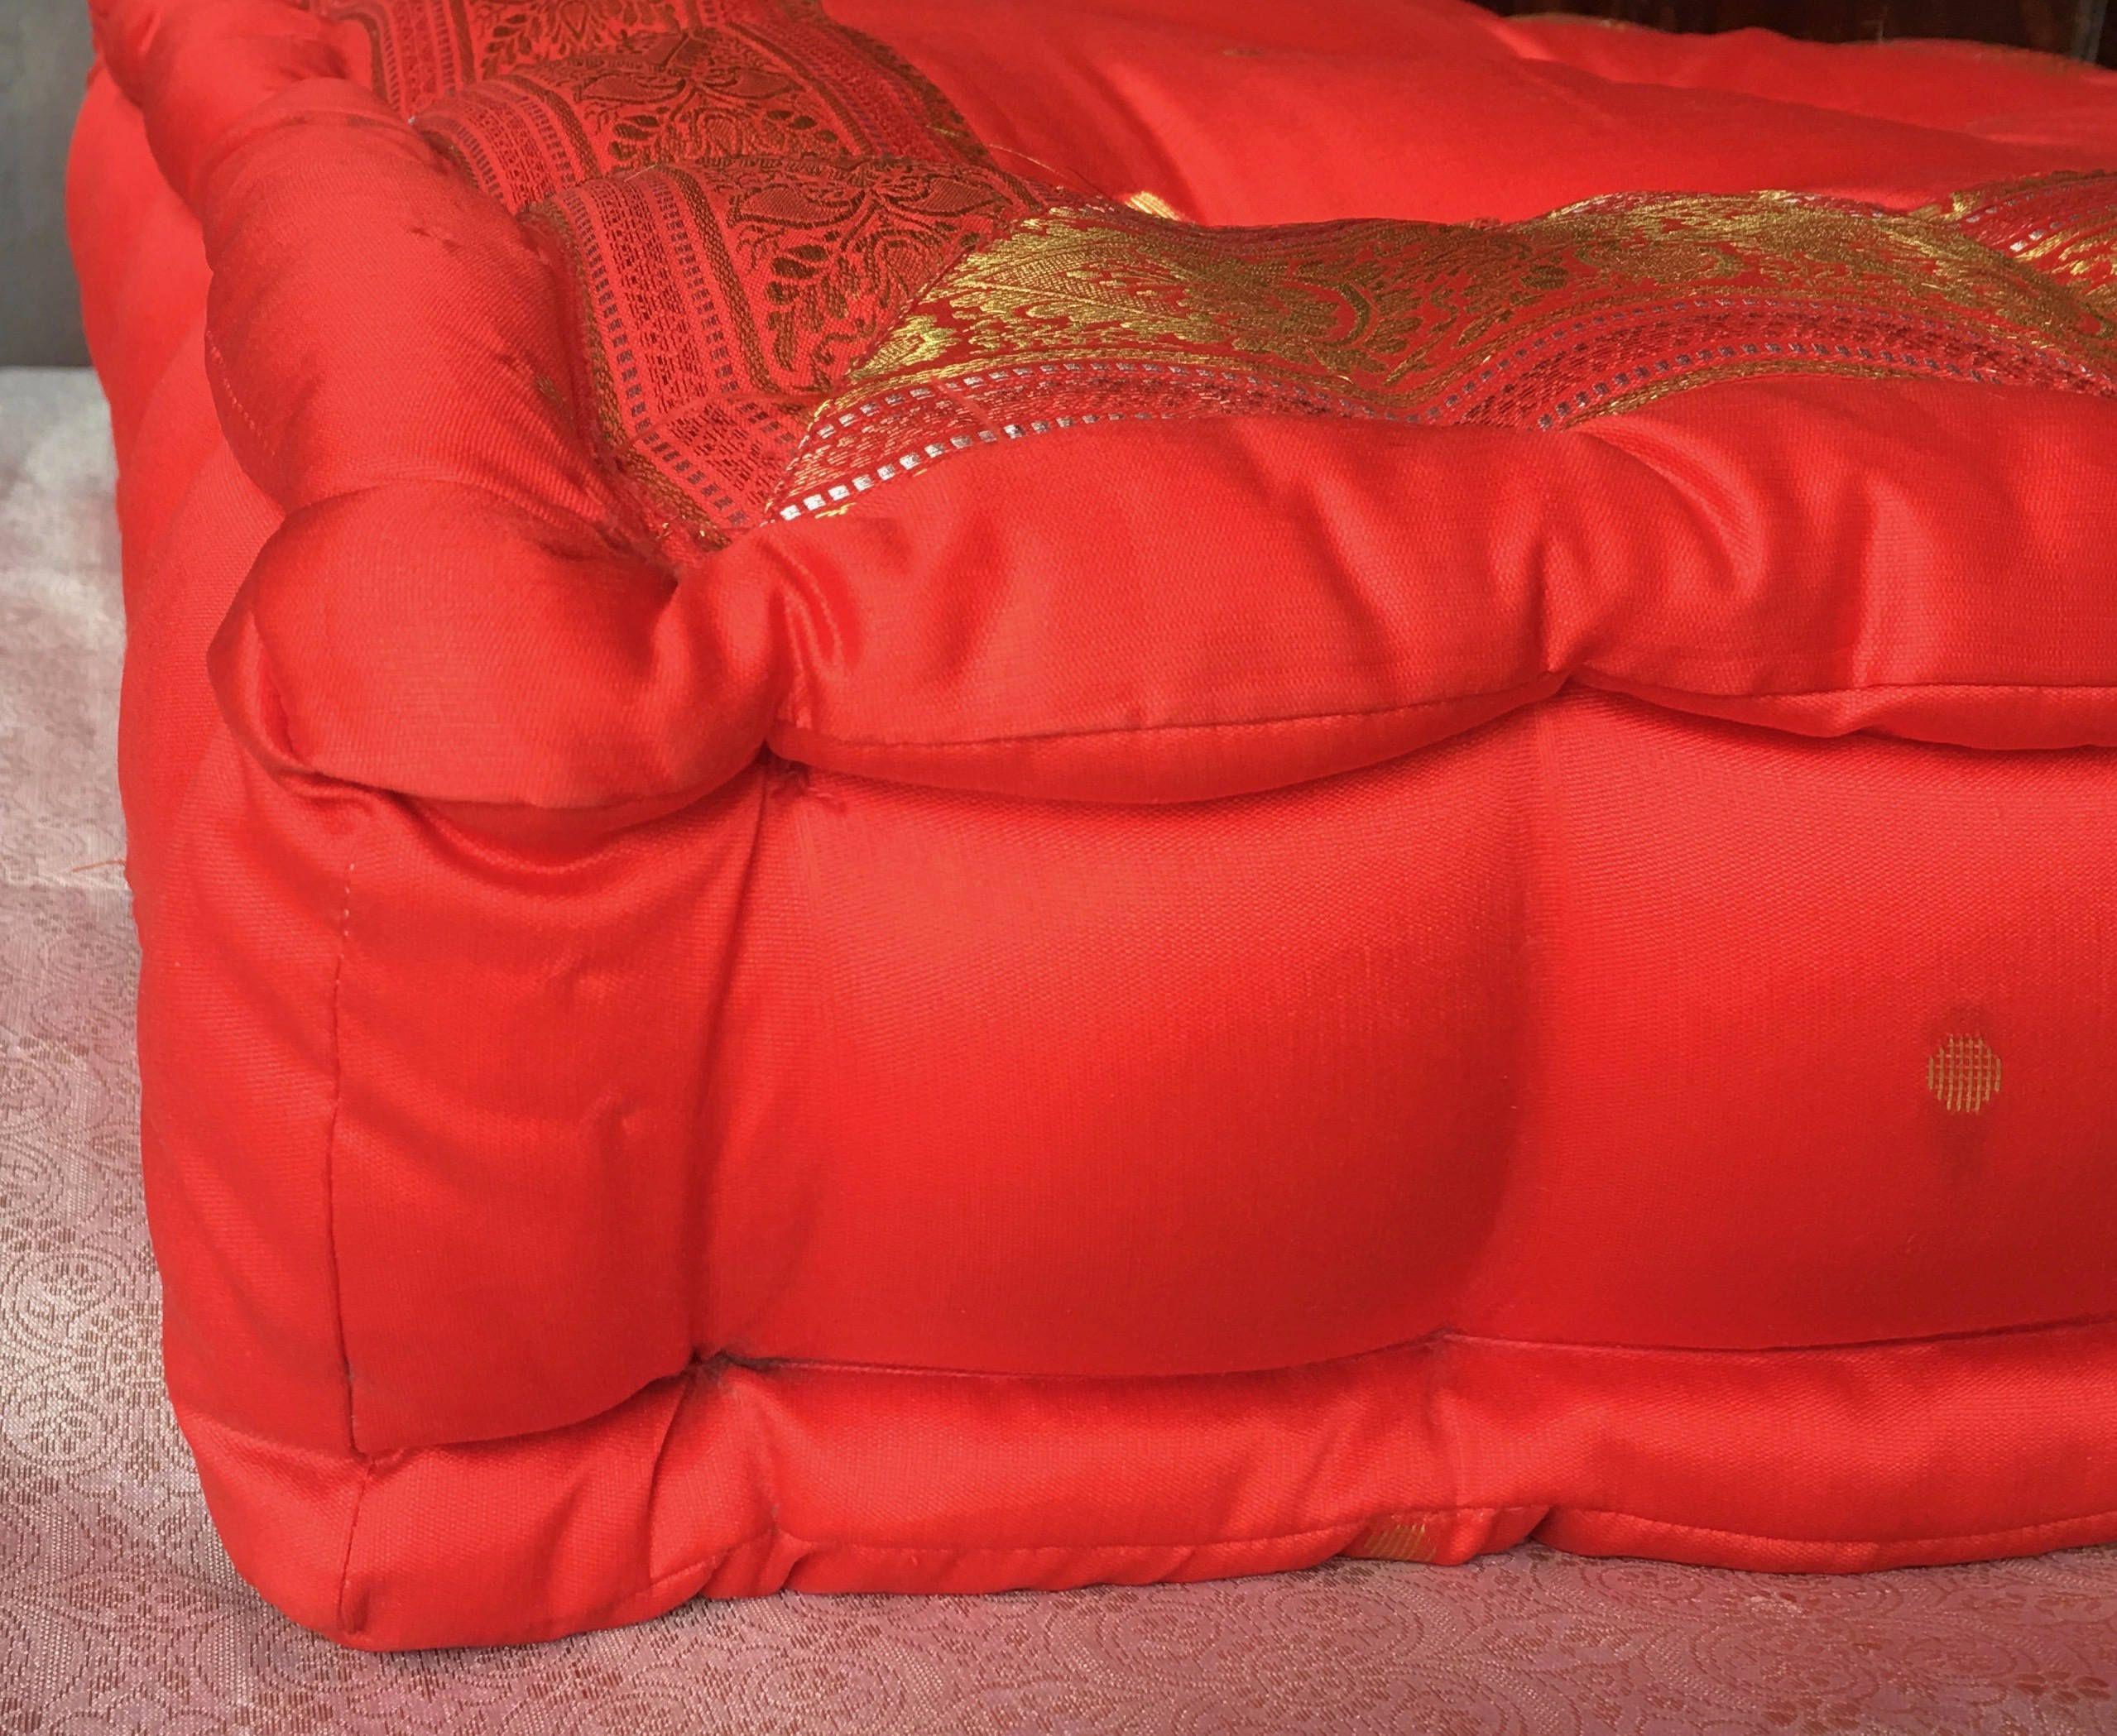 Red floor cushion, meditation pillow, floor sitting cushion, large ...